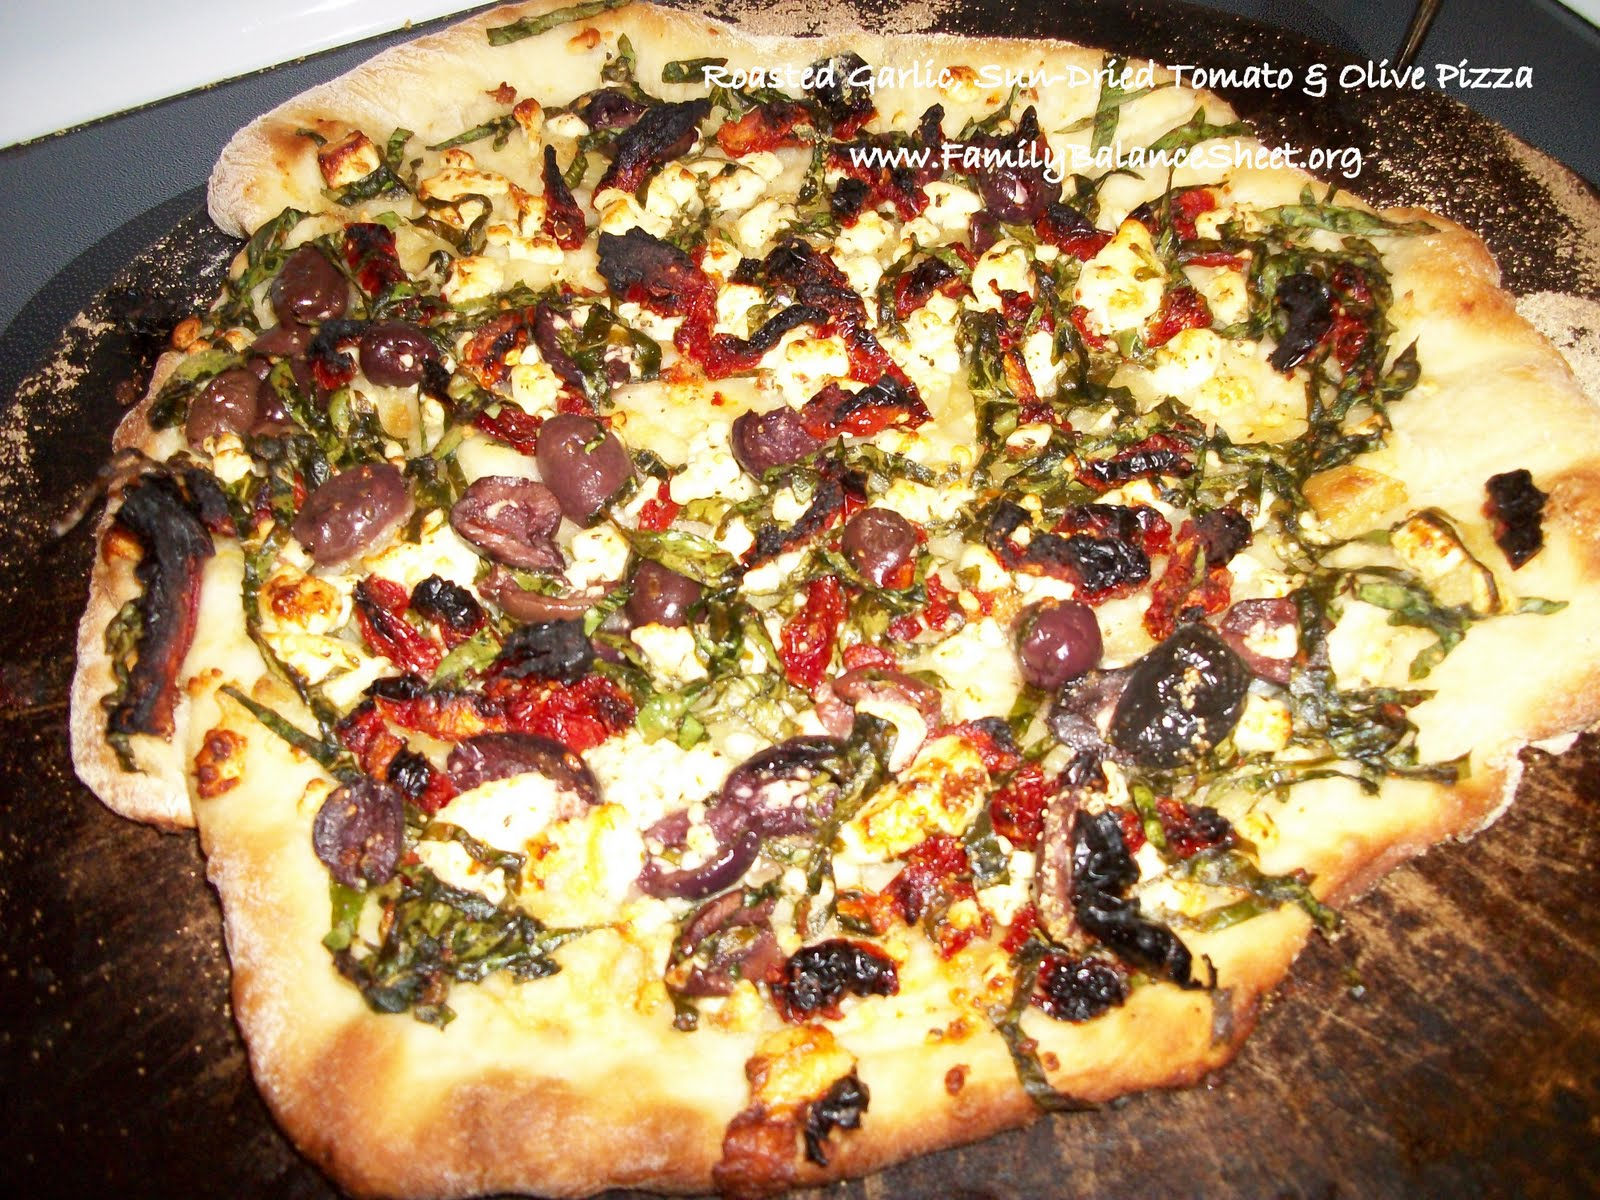 roasted garlic sun dried tomato olive pizza family balance sheet. Black Bedroom Furniture Sets. Home Design Ideas